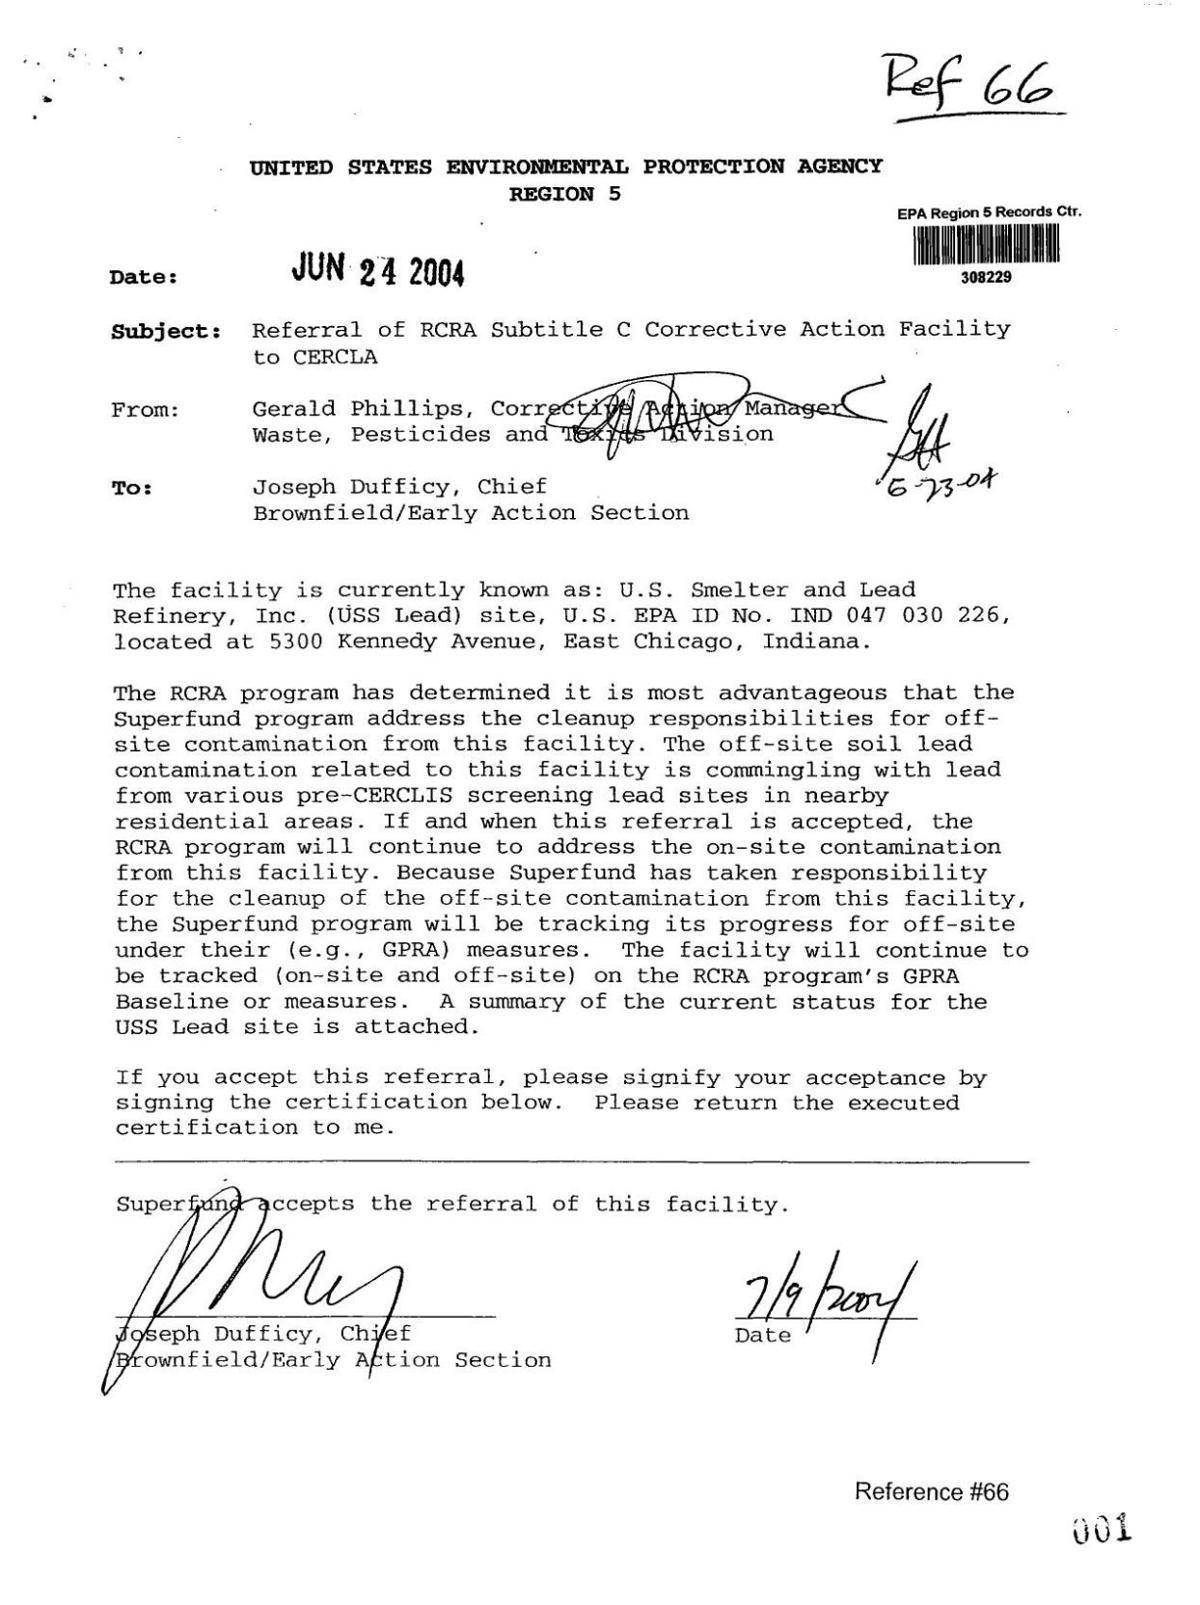 2004 EPA memo